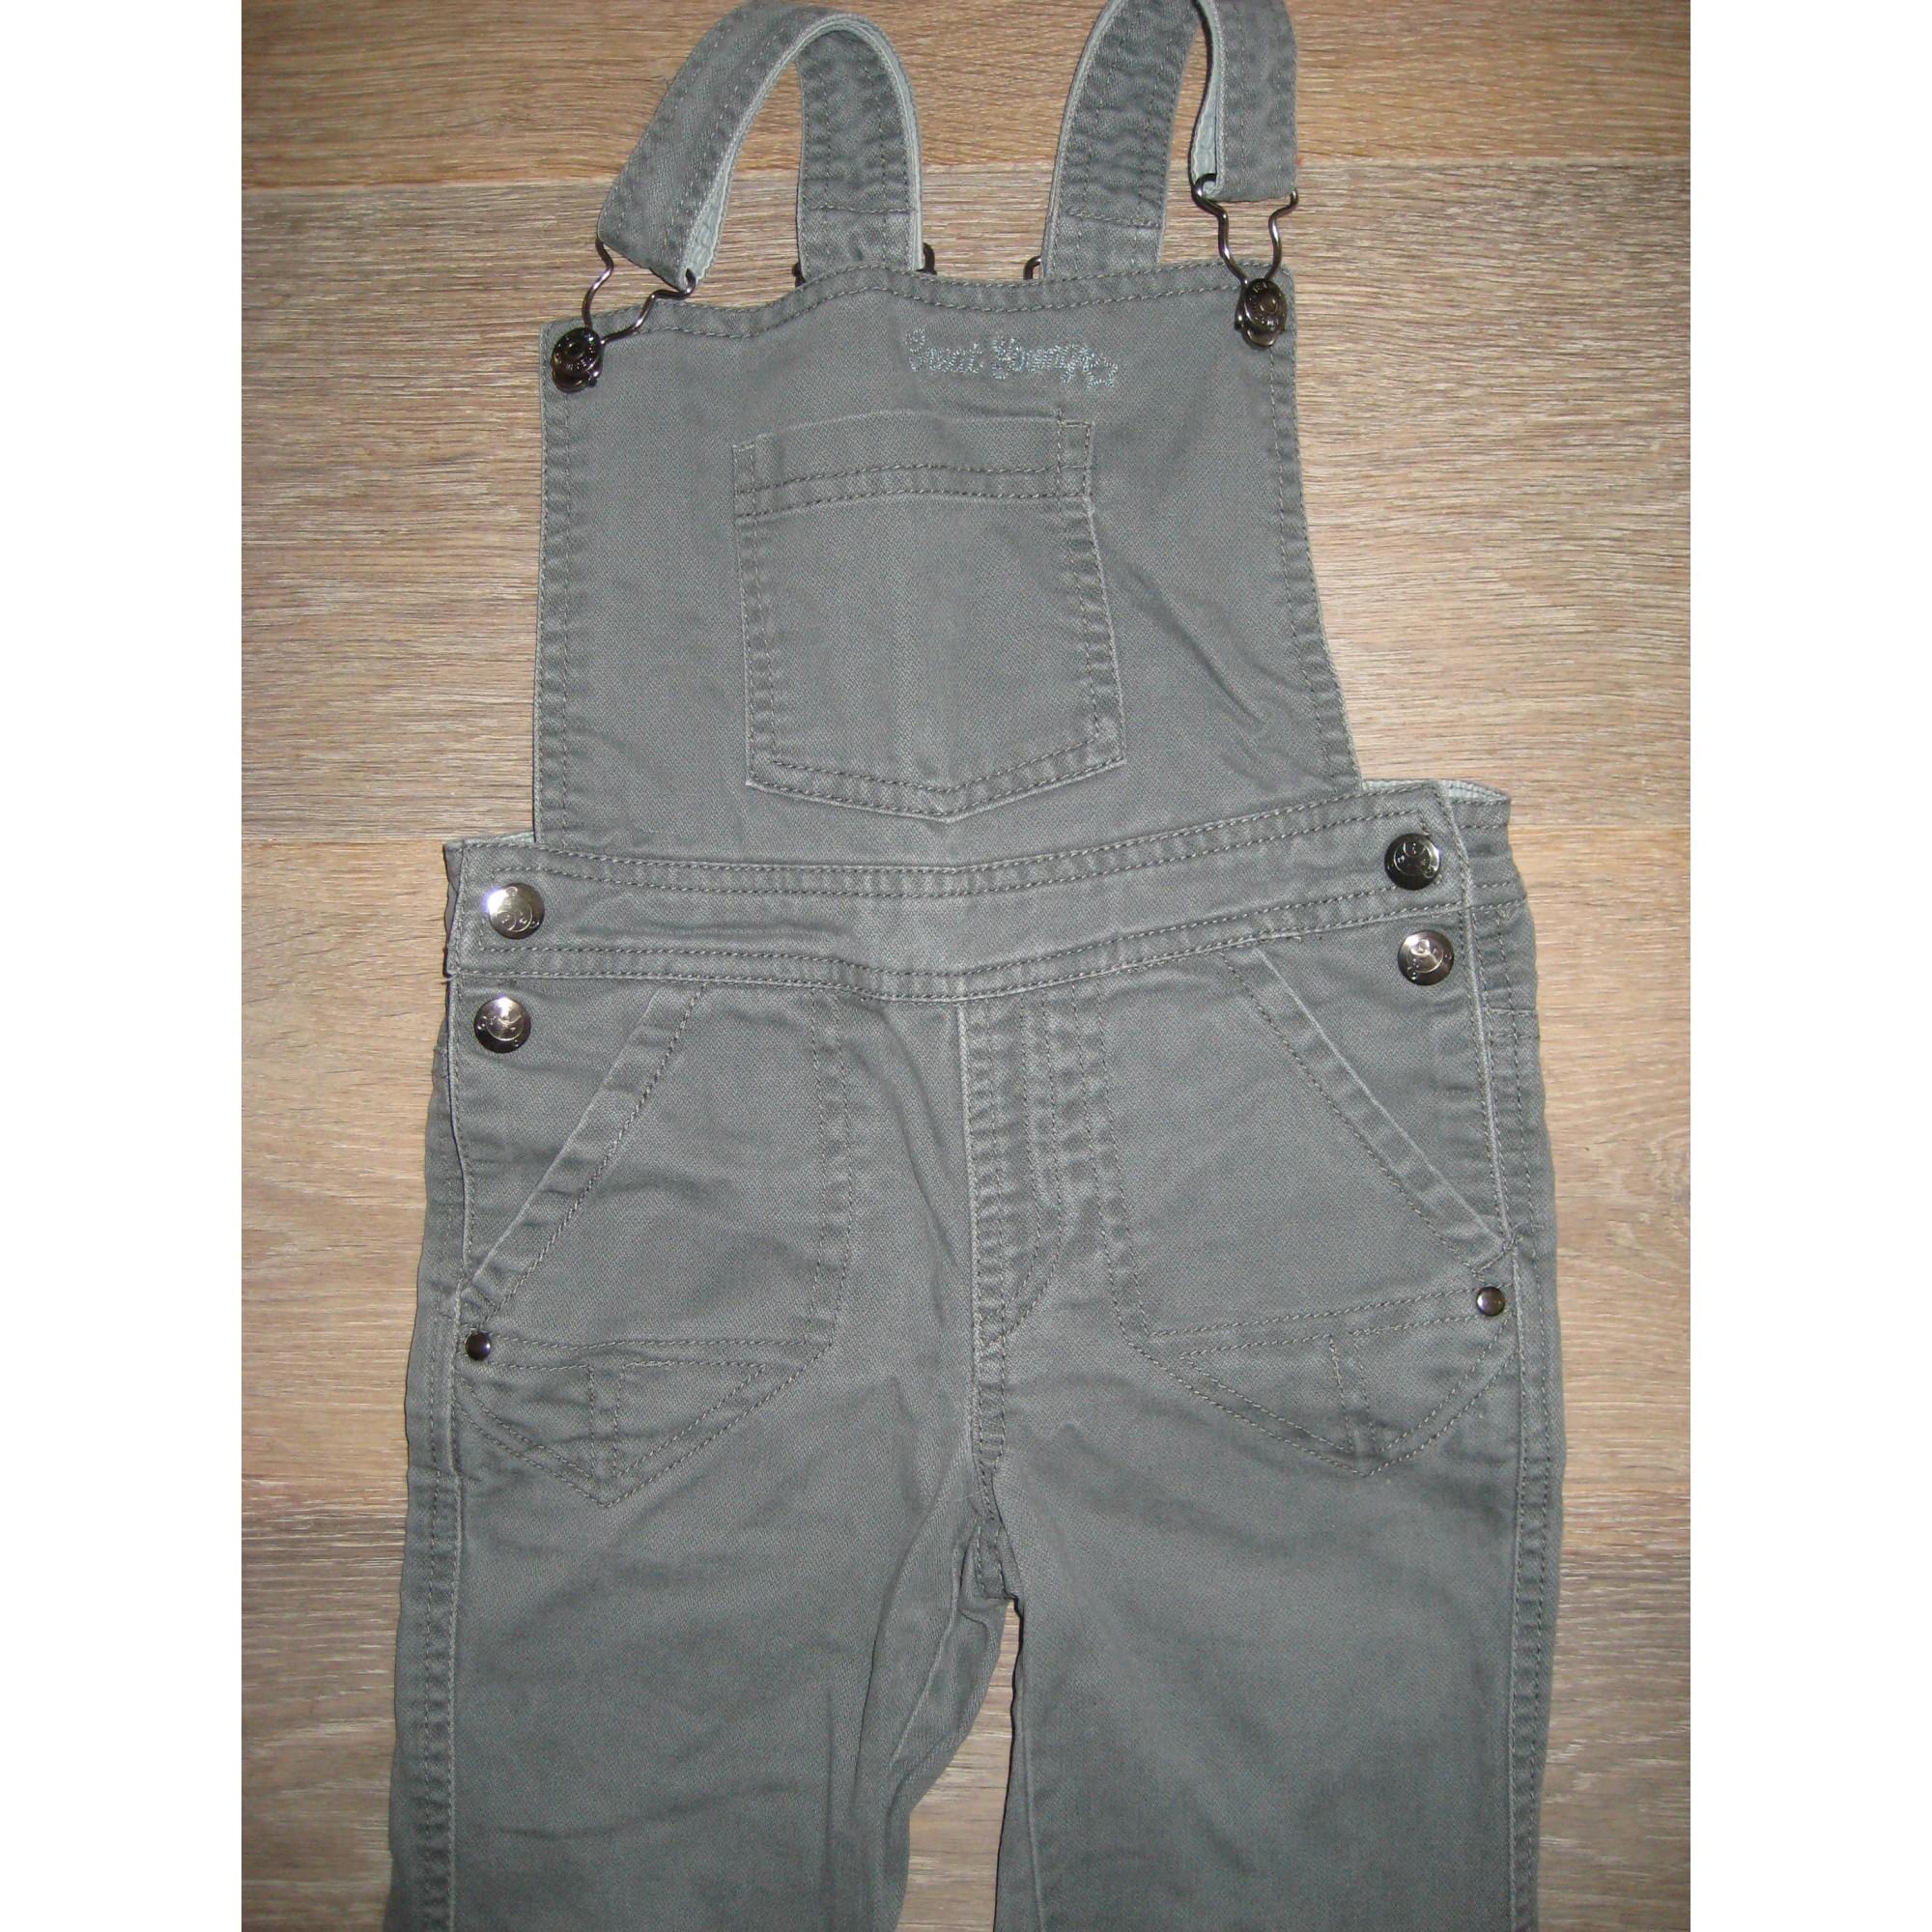 Pants Set, Outfit KIDKANAI Gray, charcoal